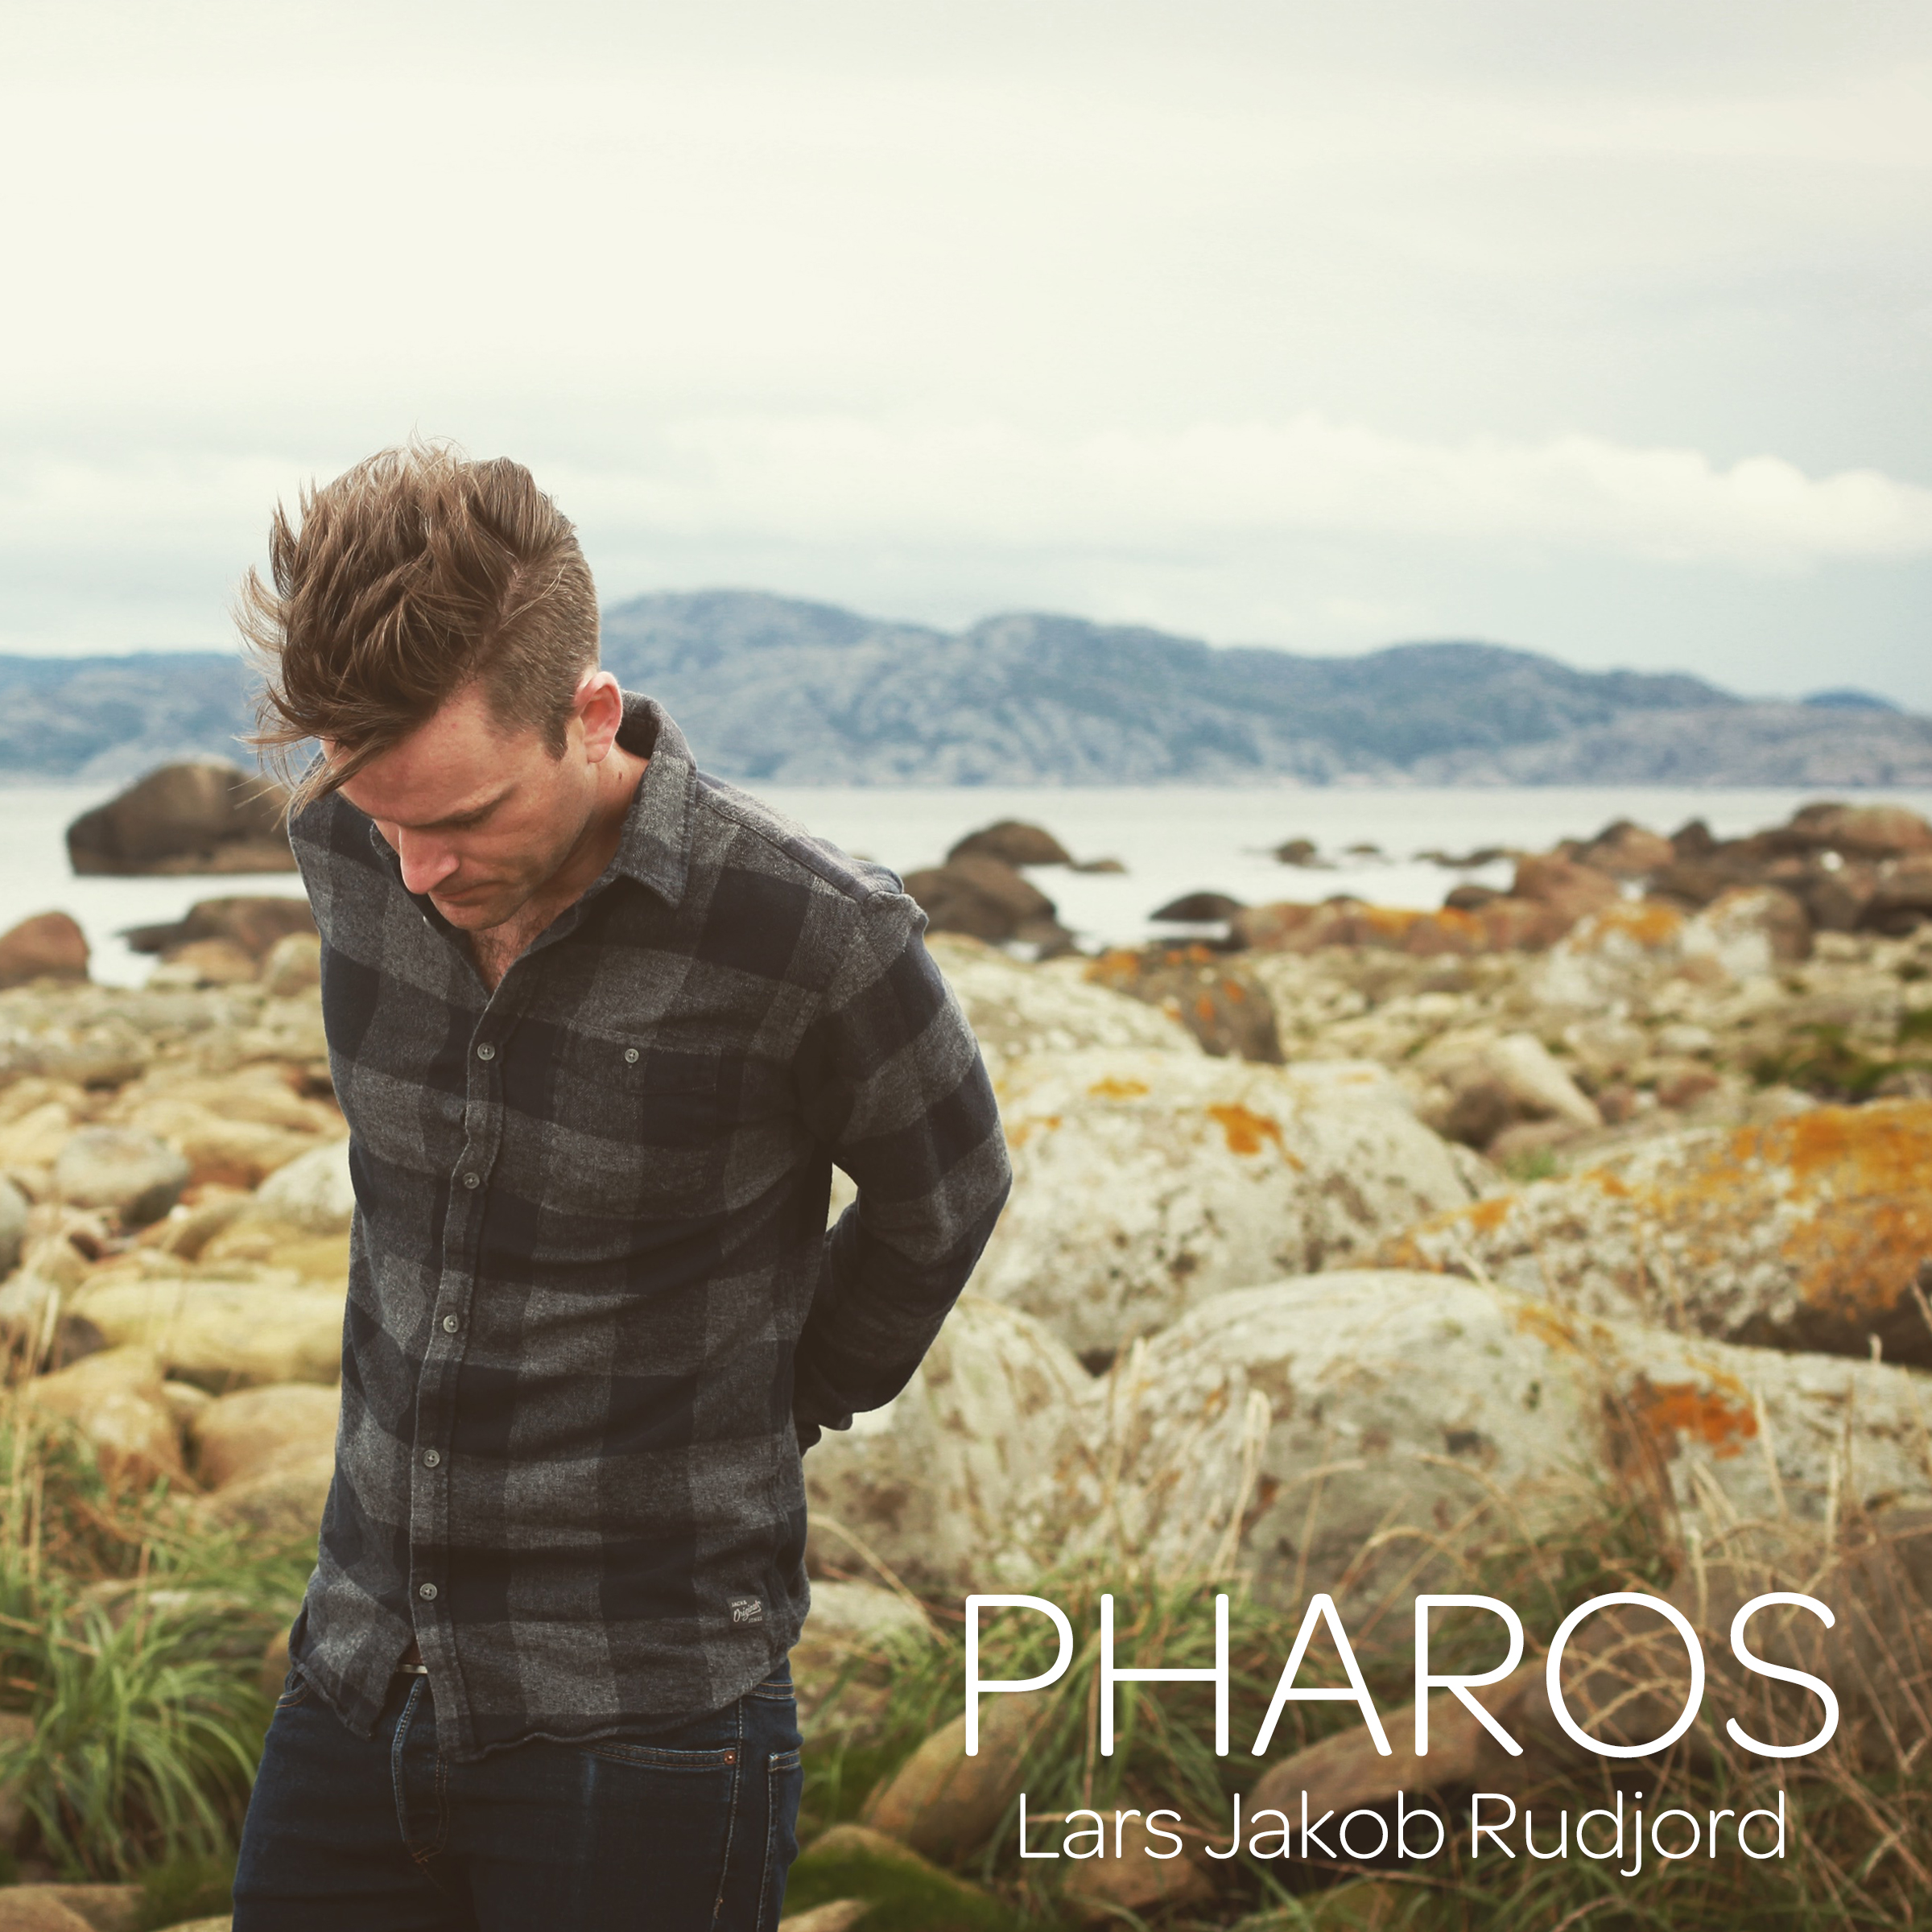 Pharos (single) - Lars Jakob Rudjord